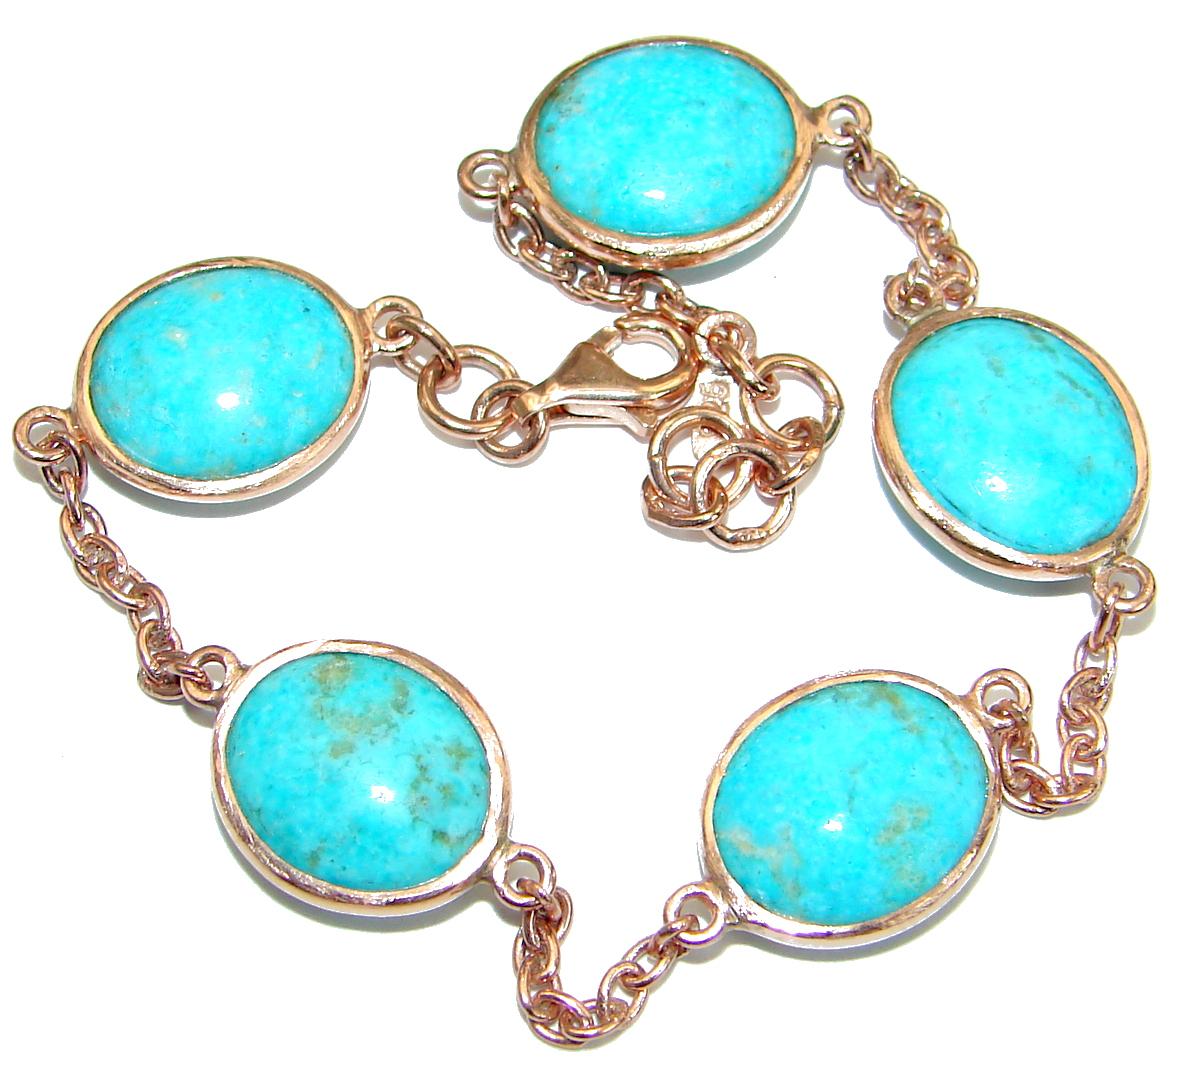 Genuine Turquoise 14K Gold over Sterling Silver handcrafted Bracelet